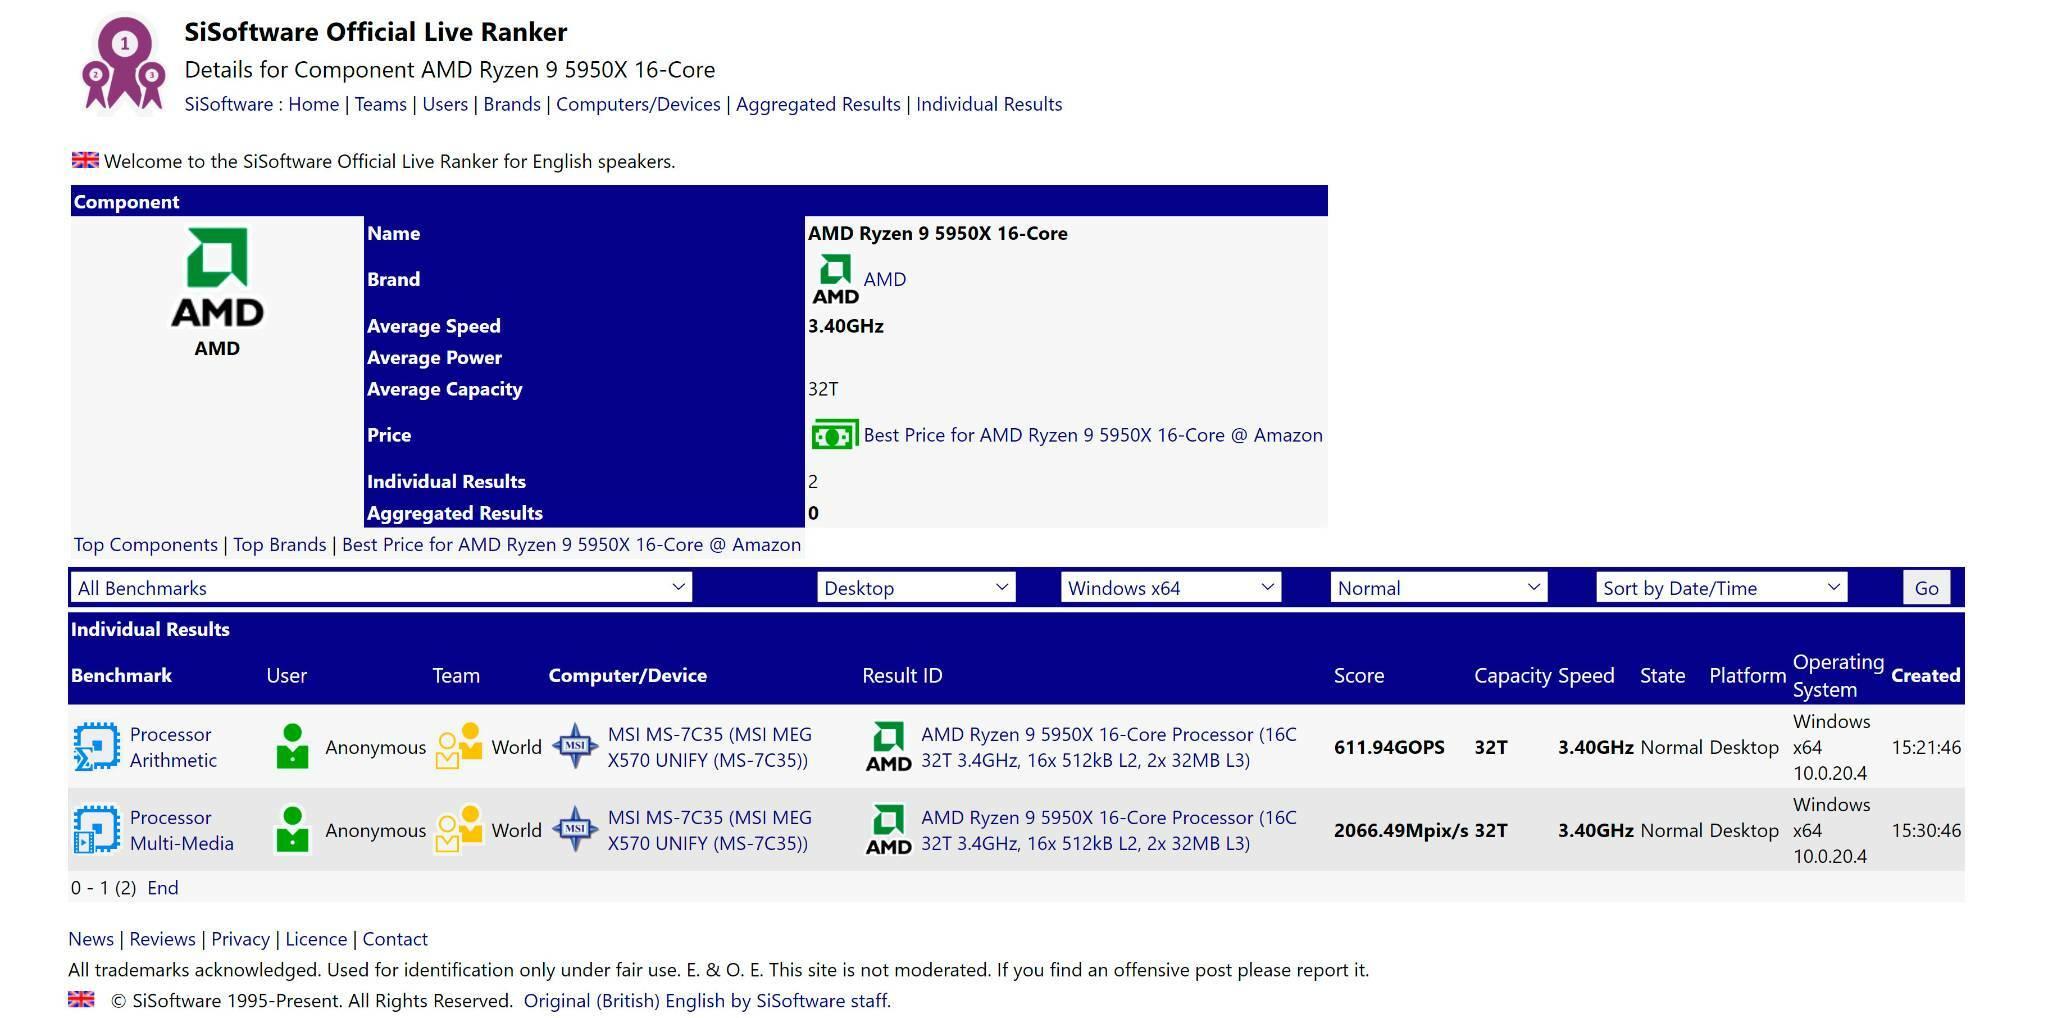 AMD Ryzen 9 5950X benchmark